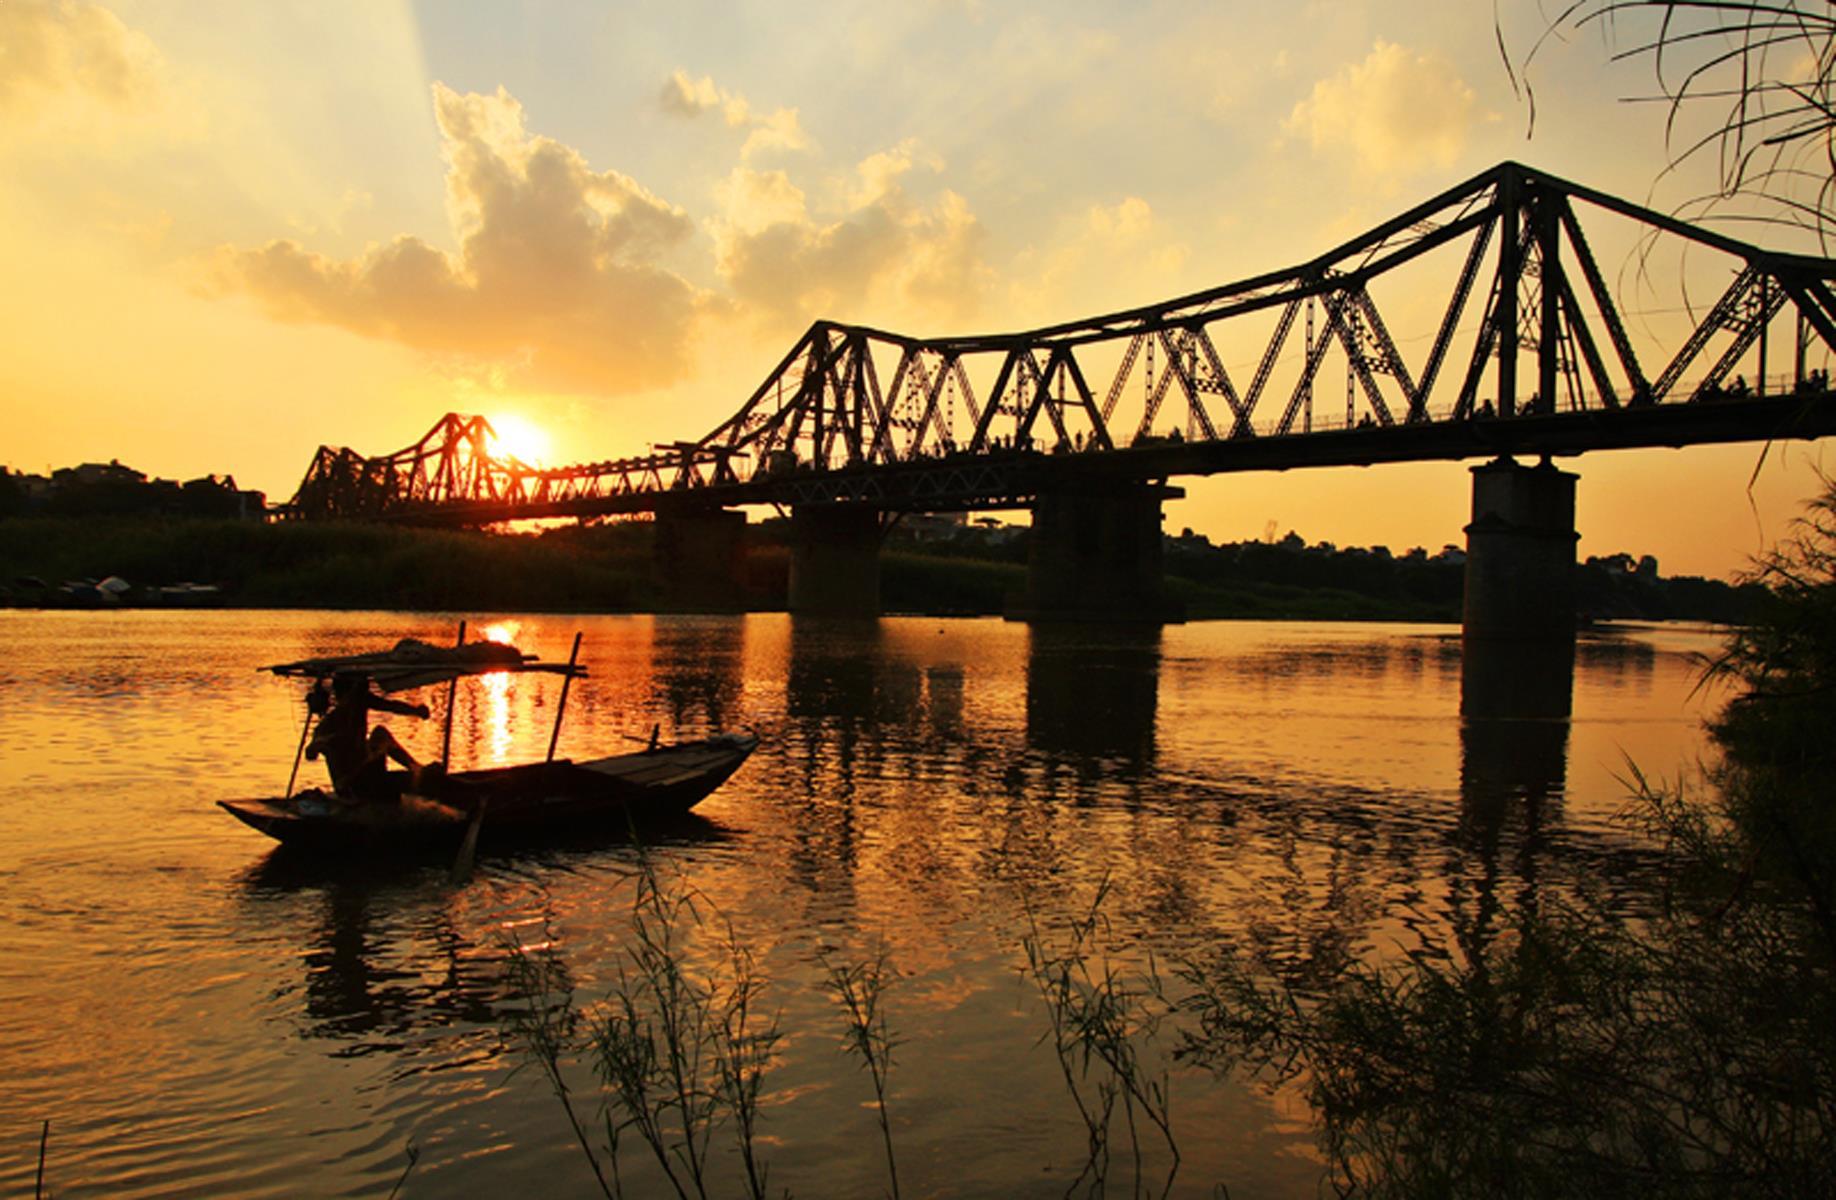 Sunset in Long Bien Bridge